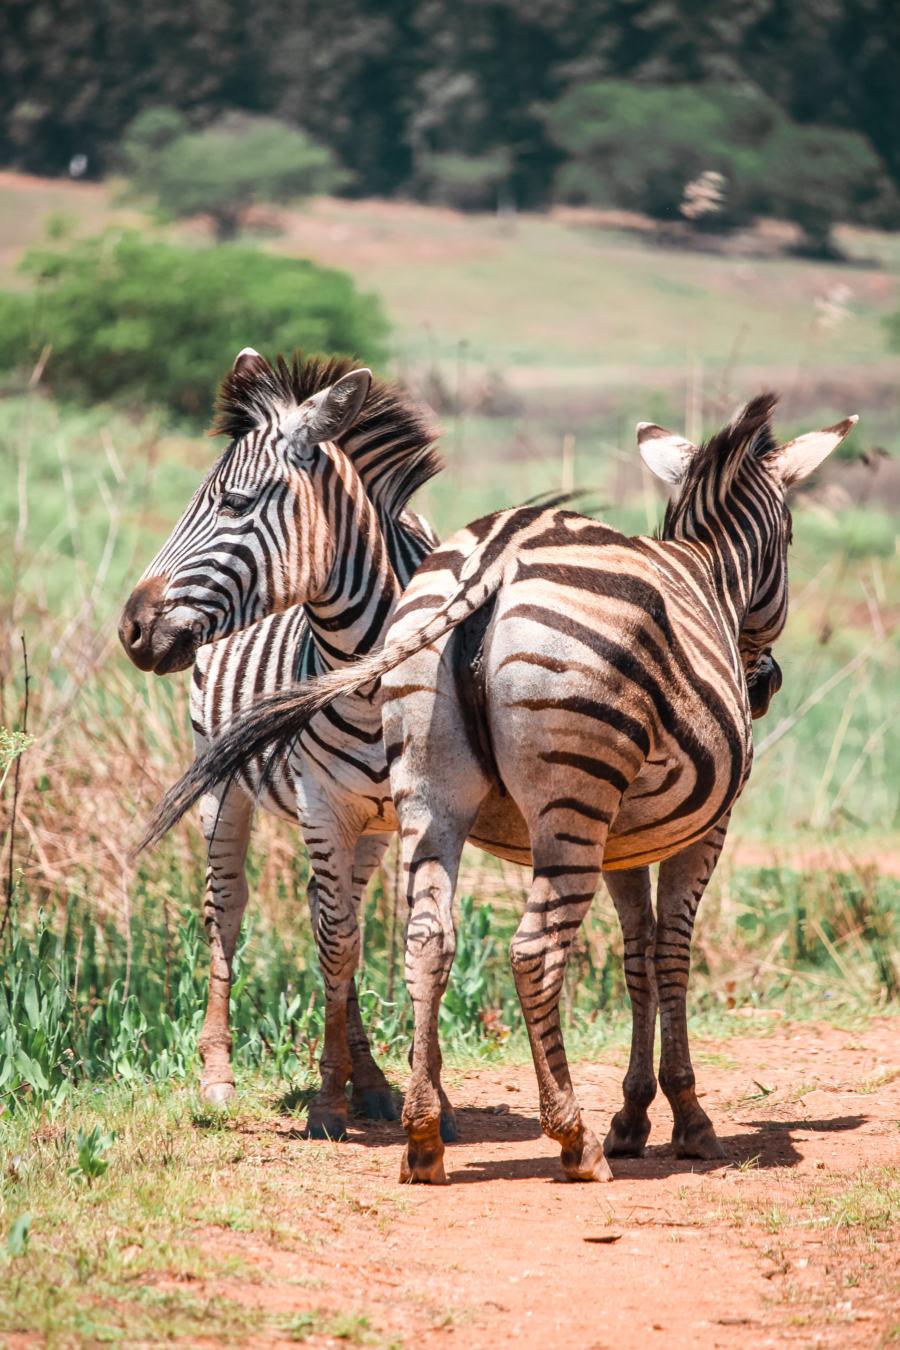 Two zebras in Mlilwane National Park in Swaziland